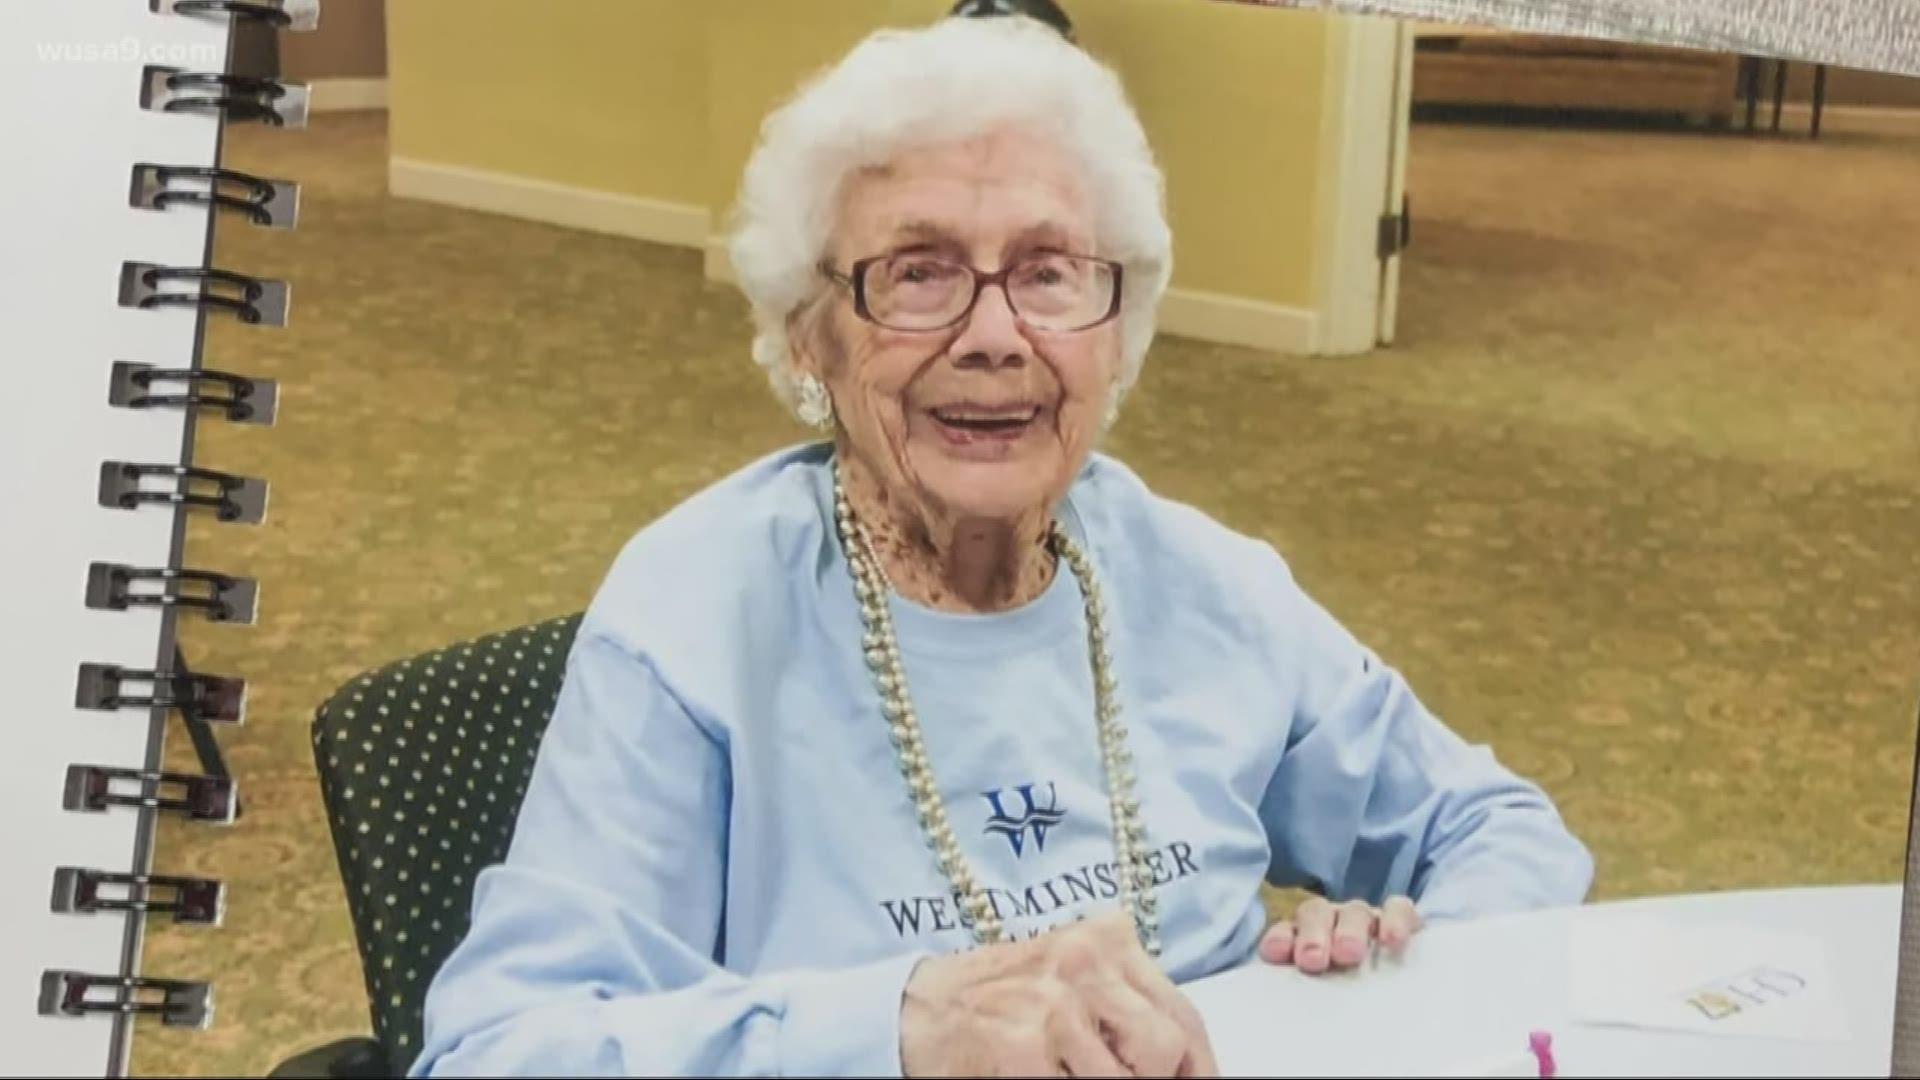 Doris Woodring